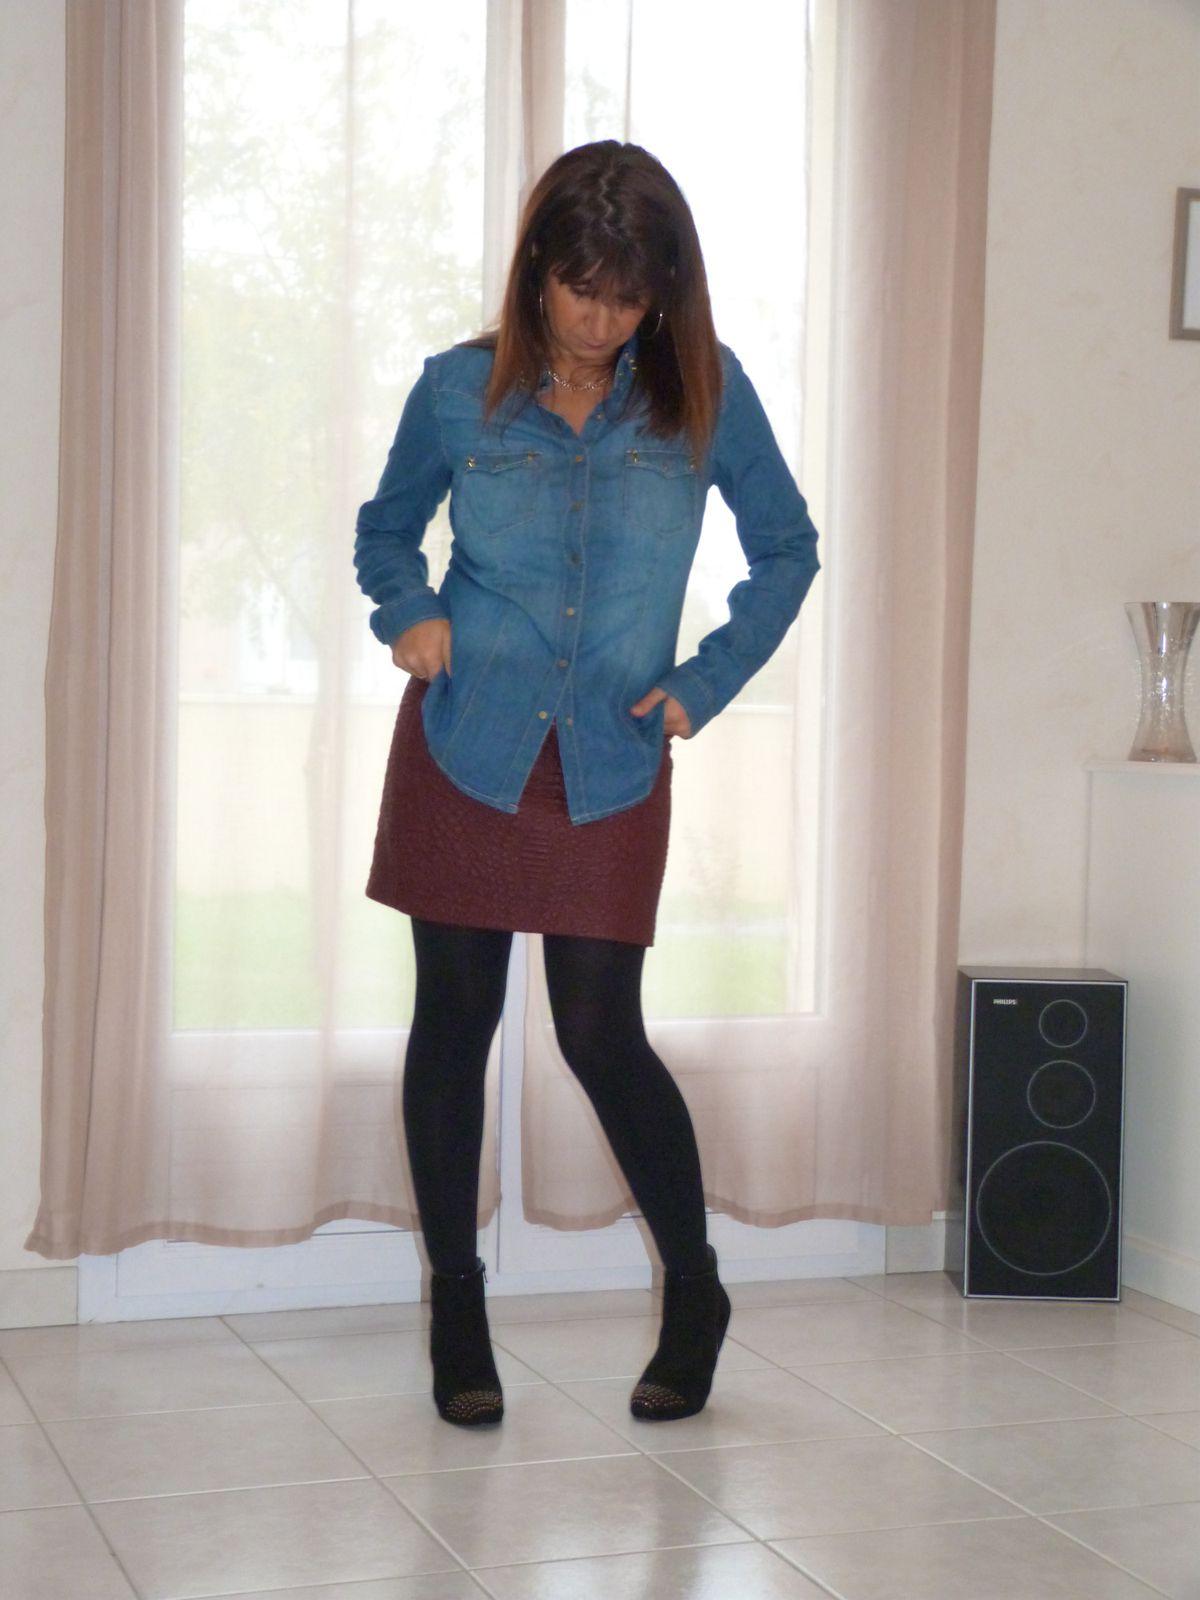 jupe :PROMOD  chemise et blouson :STRADIVARIUS   bottines : GEMO.